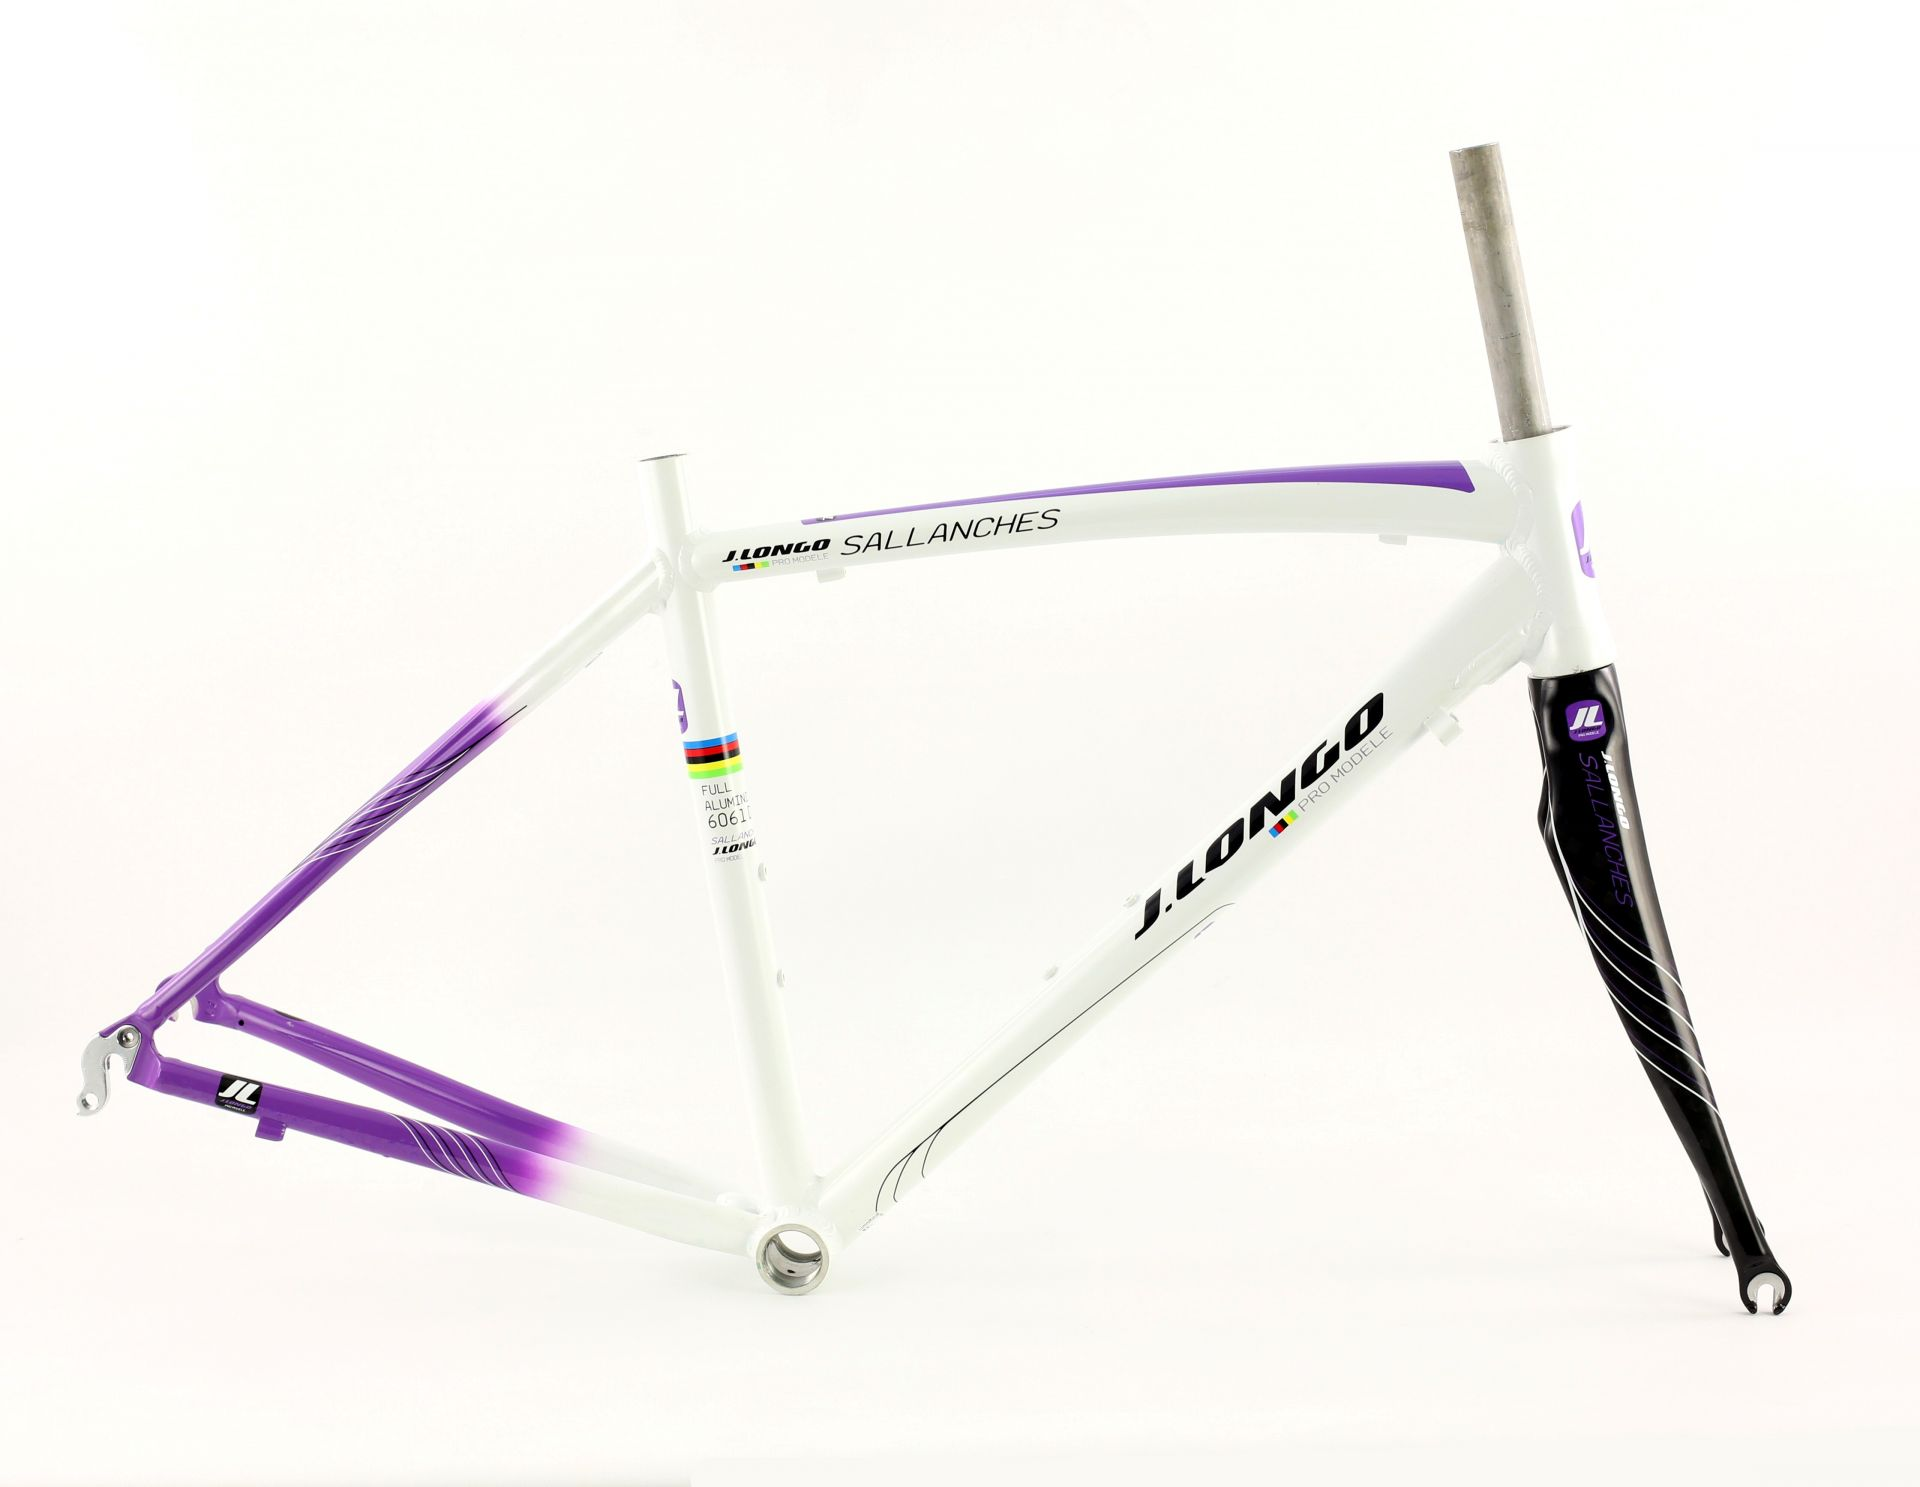 Cadre vélo fitness J.Longo Sallanches alu + fourche carbone - S